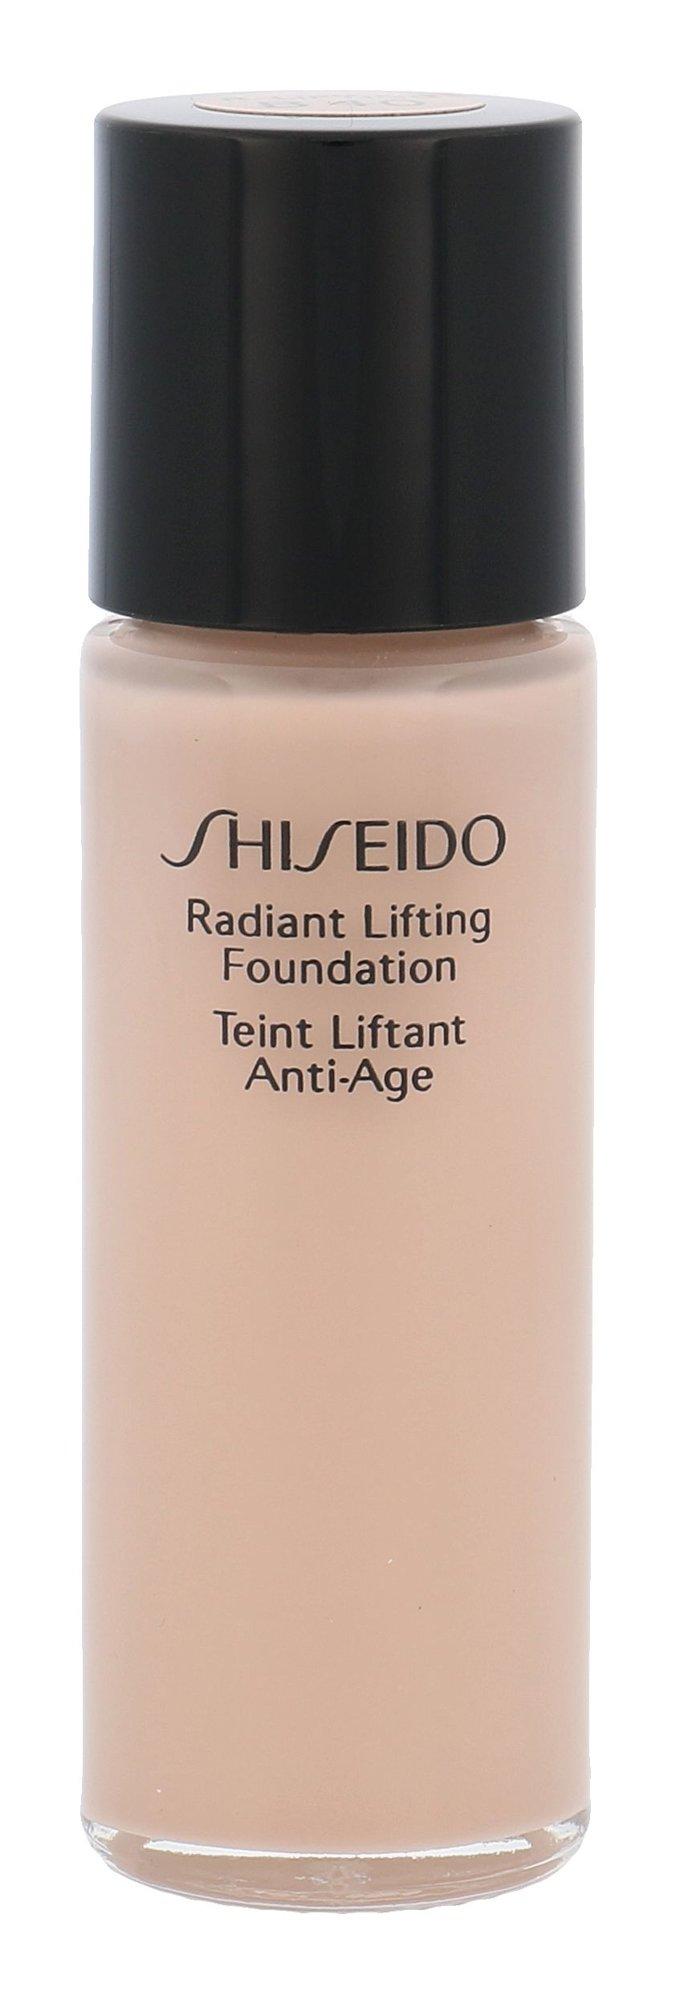 Shiseido Radiant Lifting Foundation Cosmetic 15ml B40 Natural Fair Beige